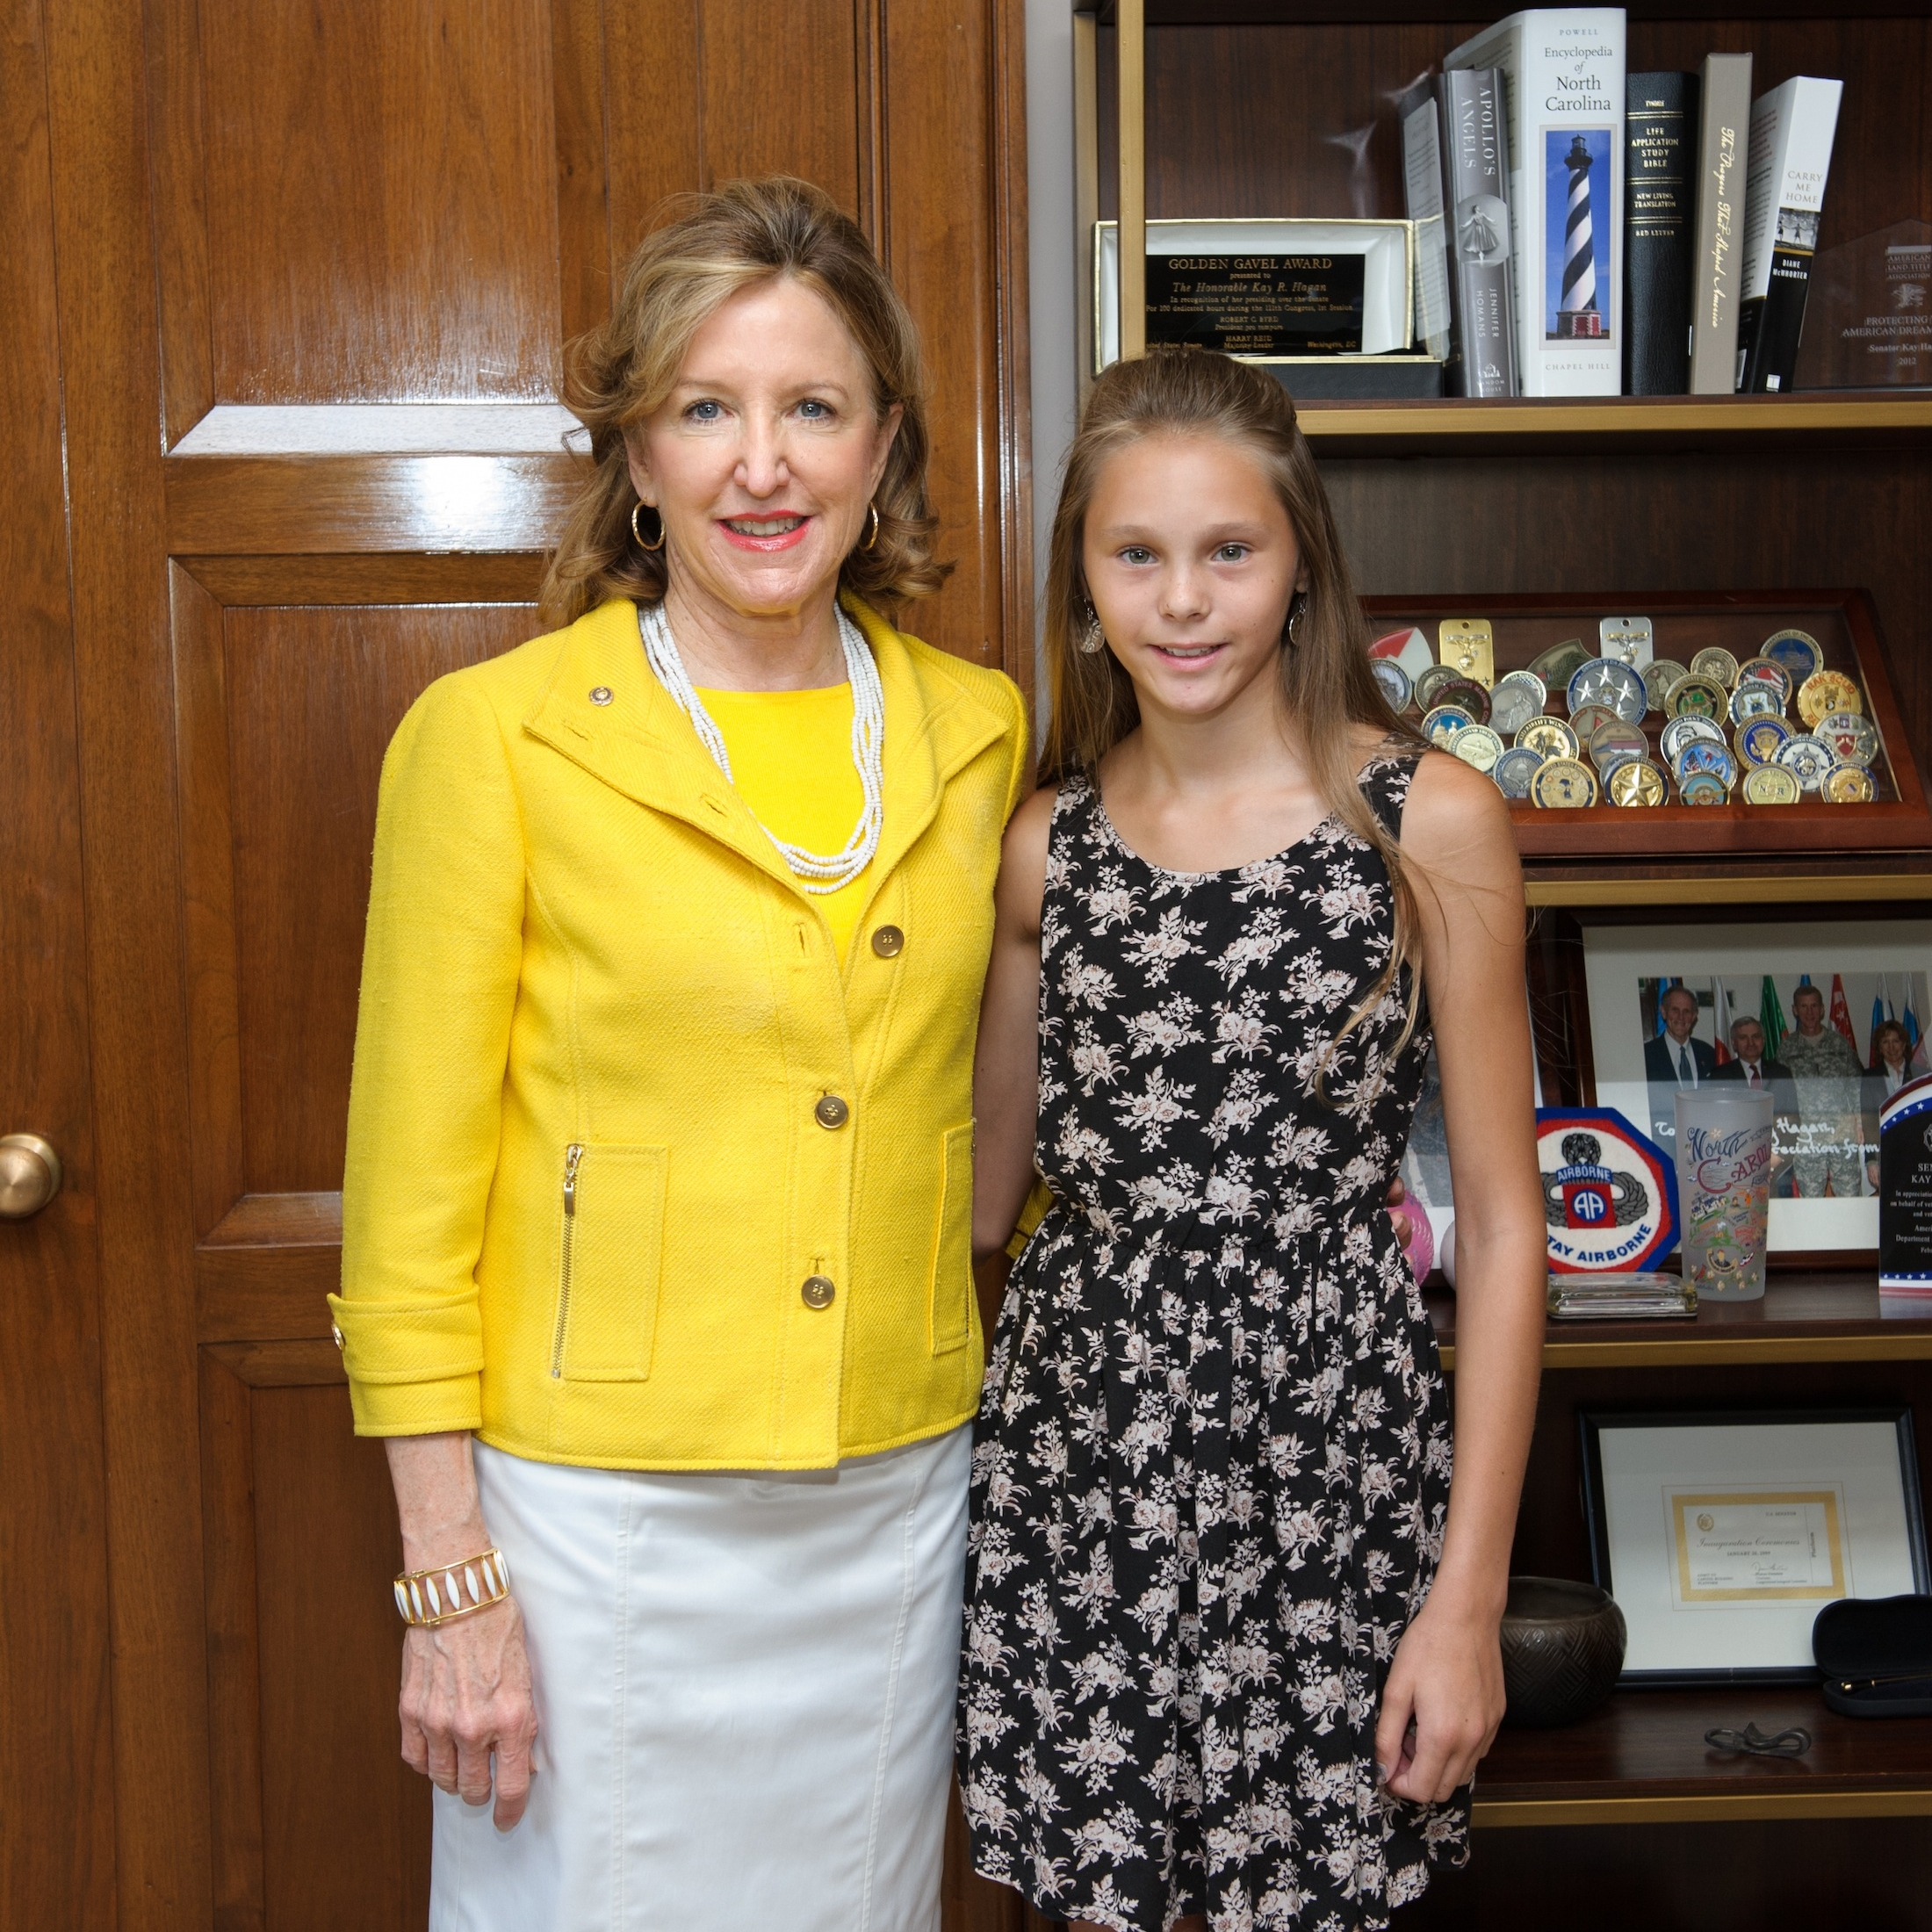 NC Senator Kay Hagan and Krysta Rutherford, Washington D.C, in 2014